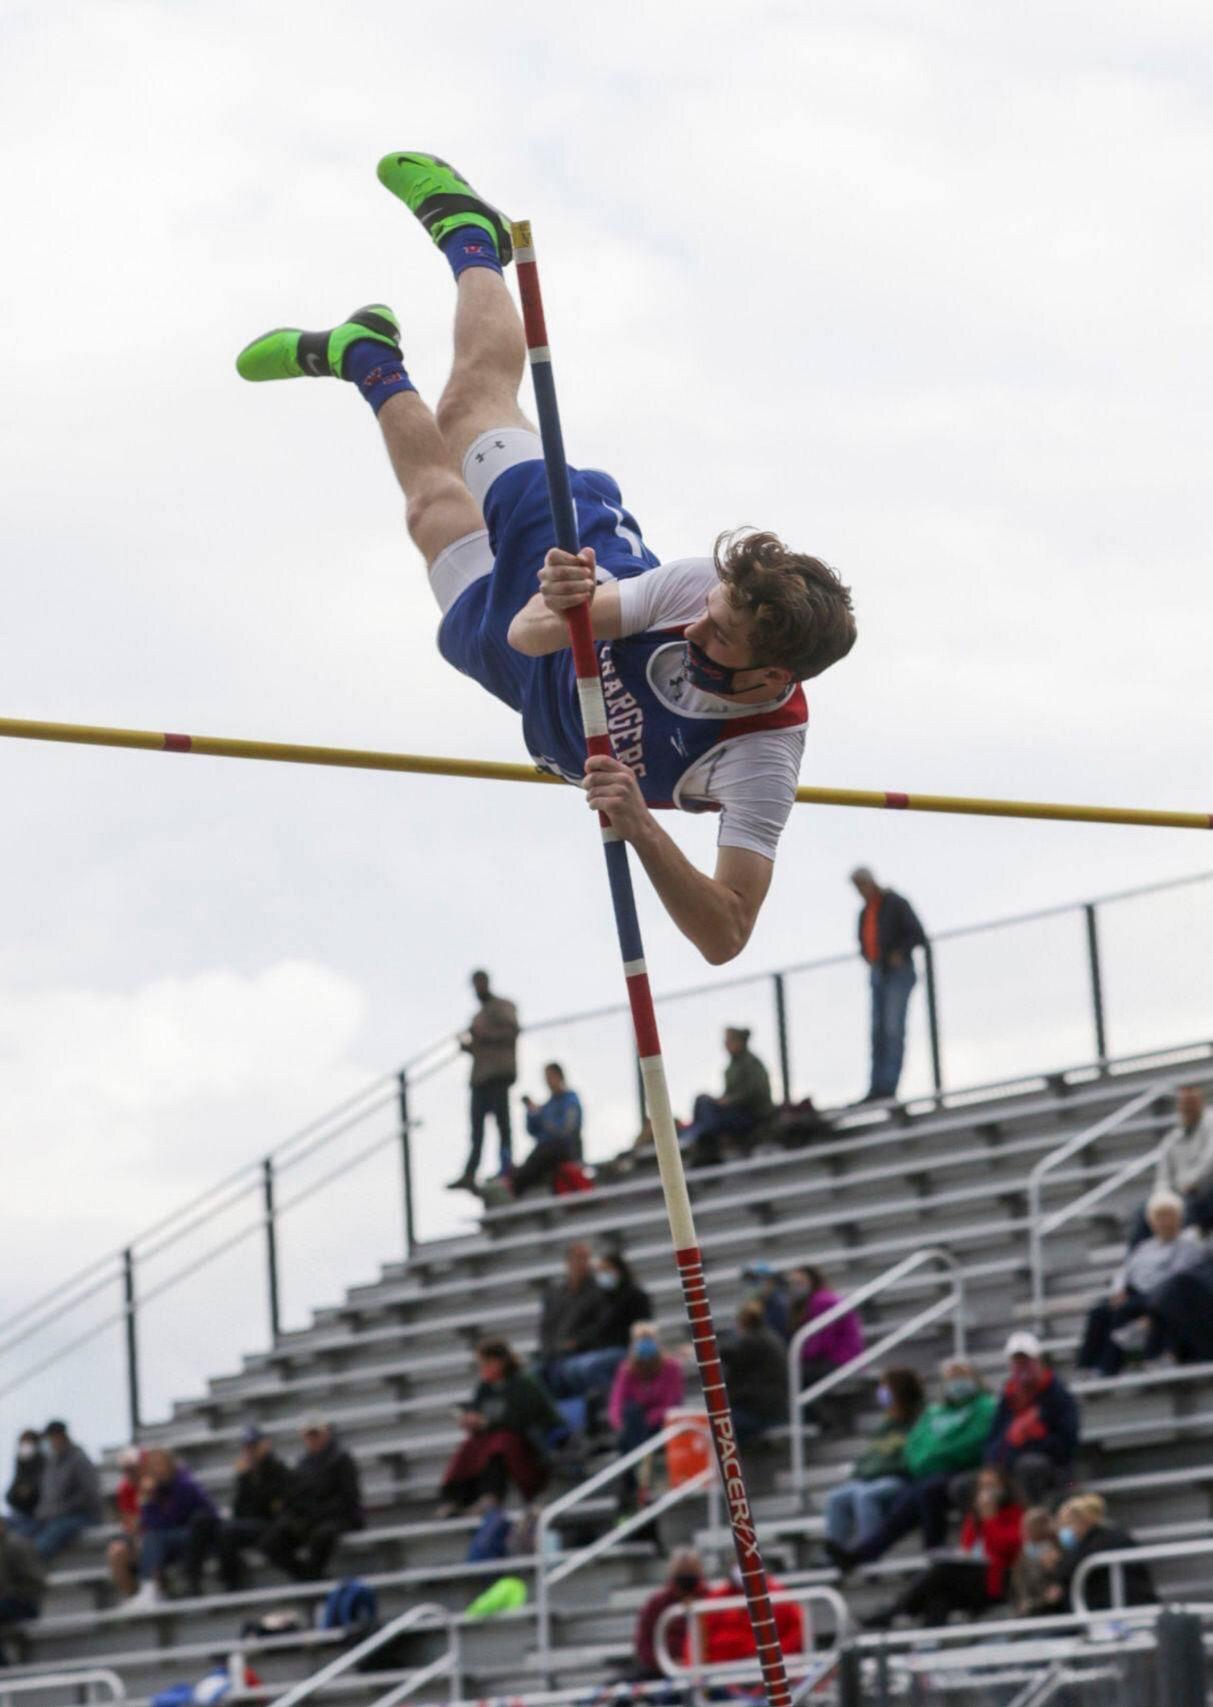 Carbondale Area senior breaks school record